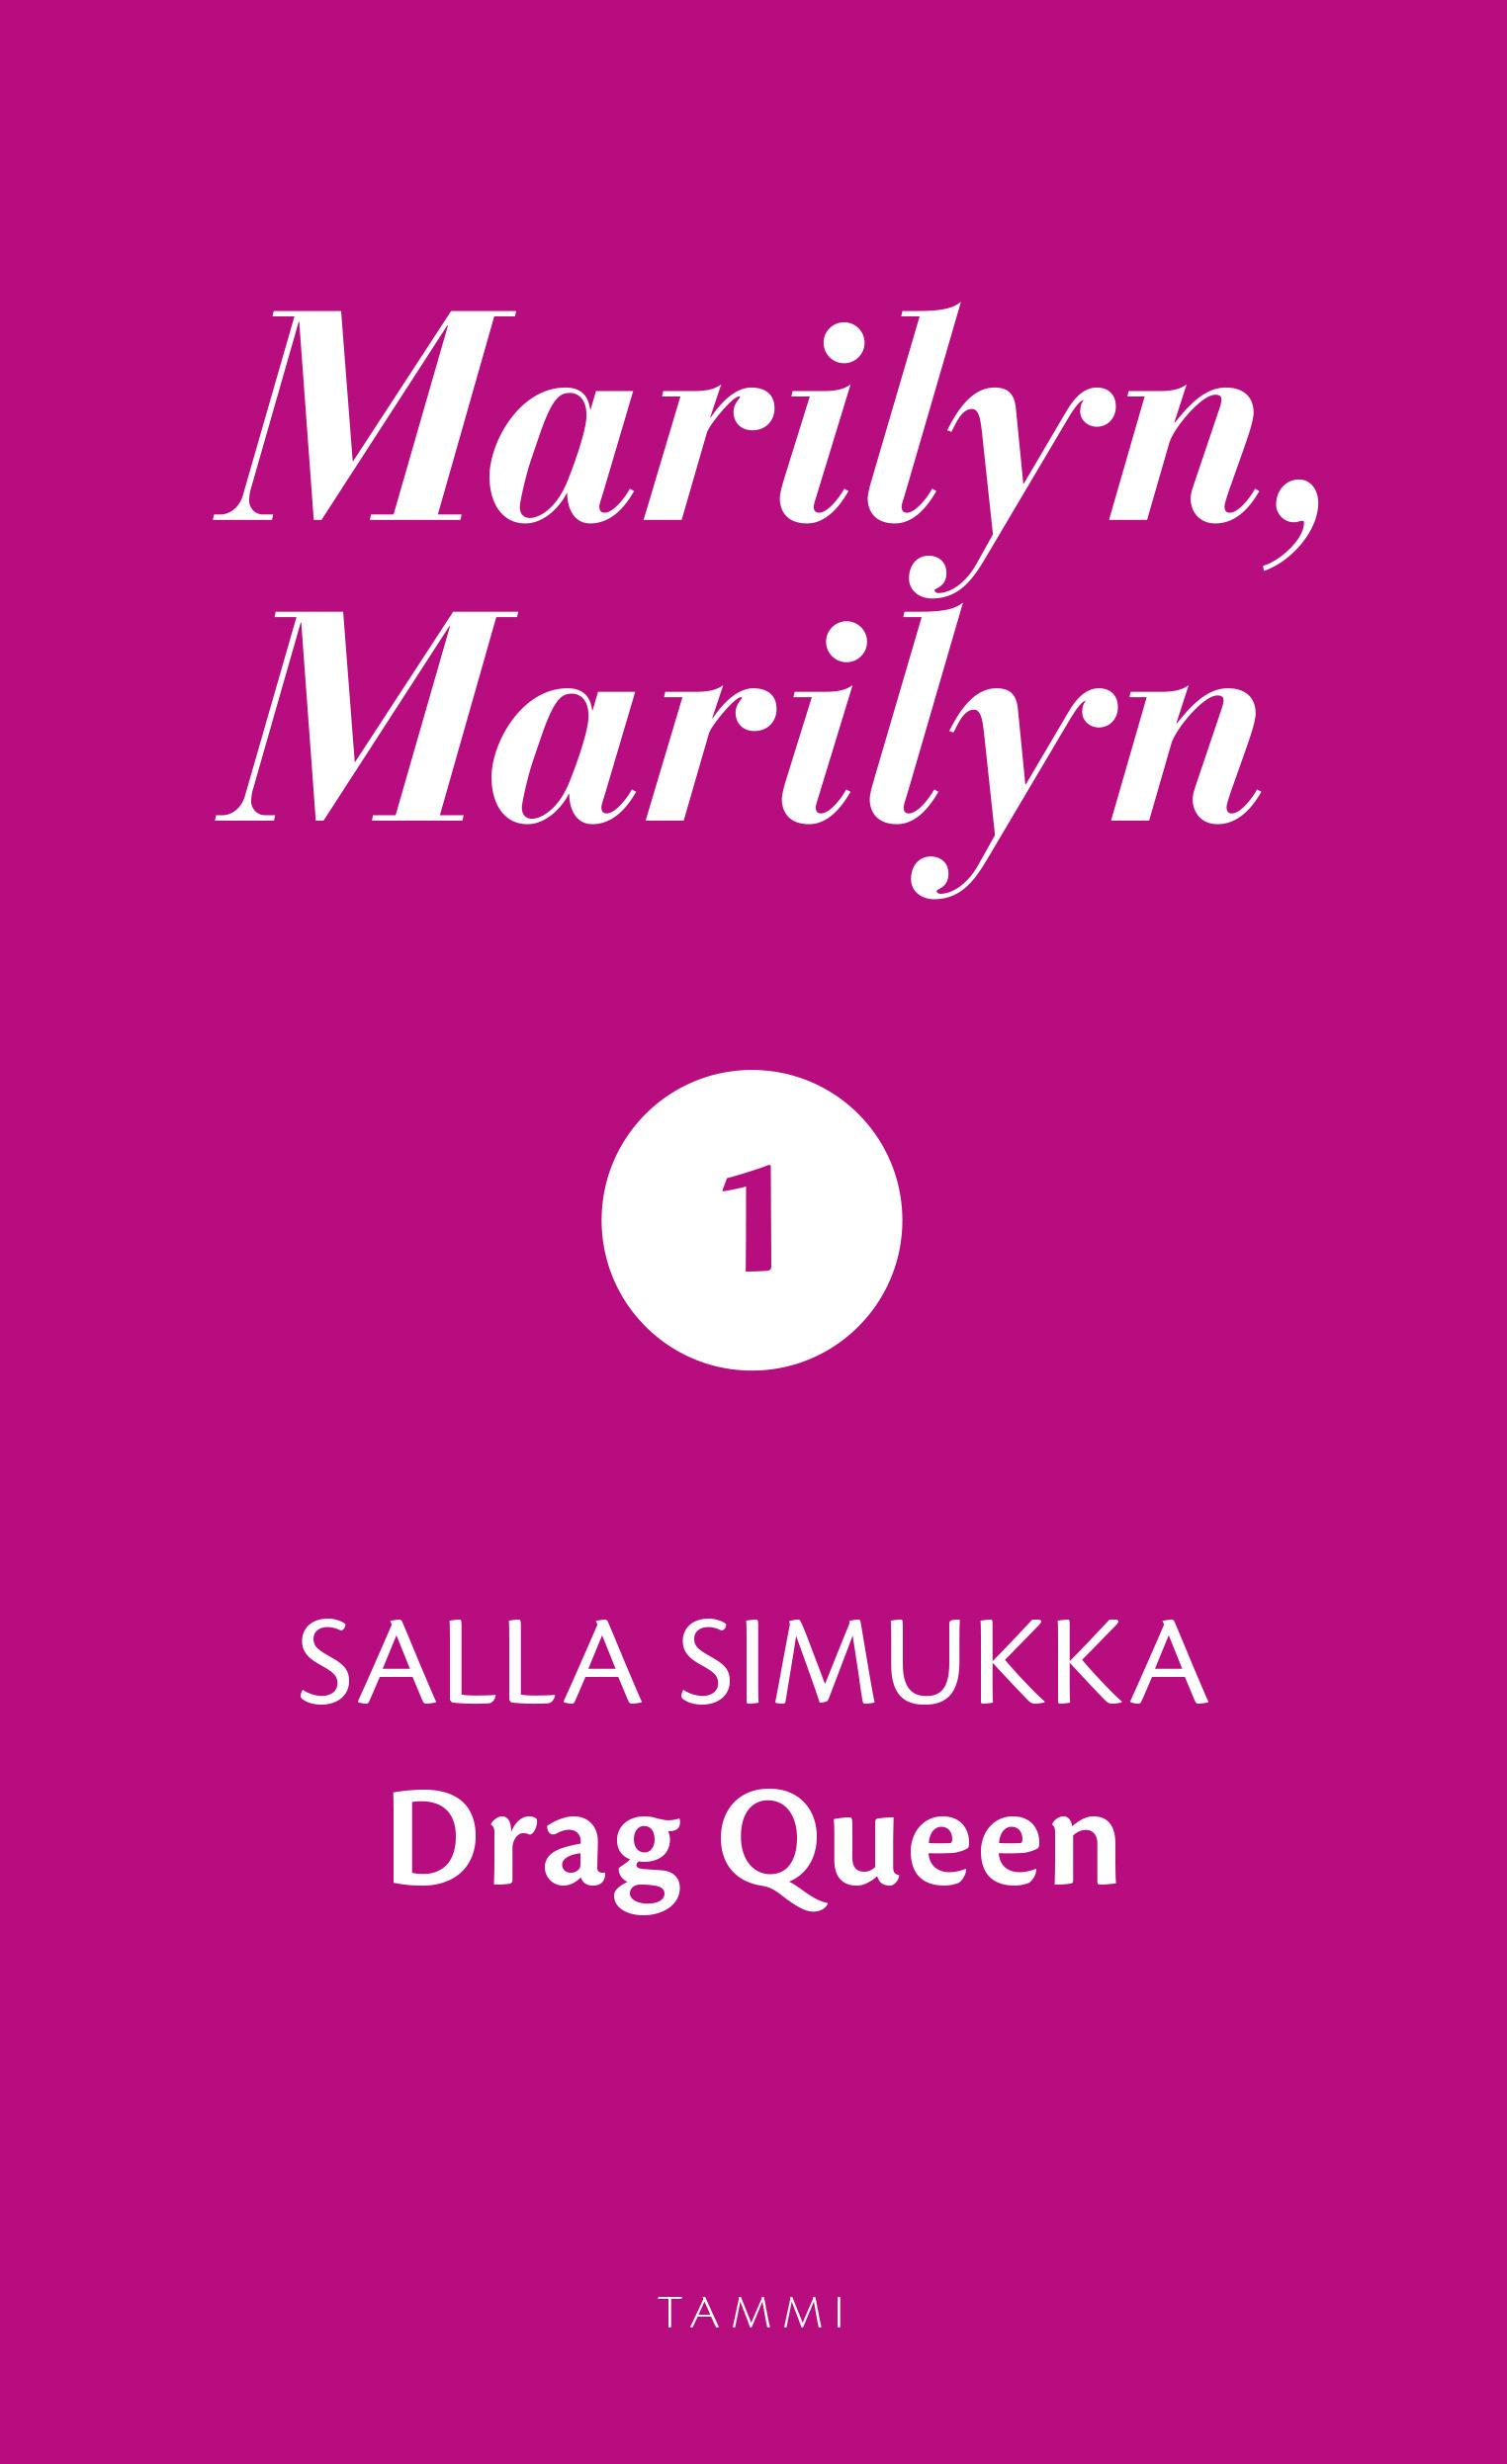 Simukka, Salla - Marilyn, Marilyn 1: Drag Queen, e-kirja